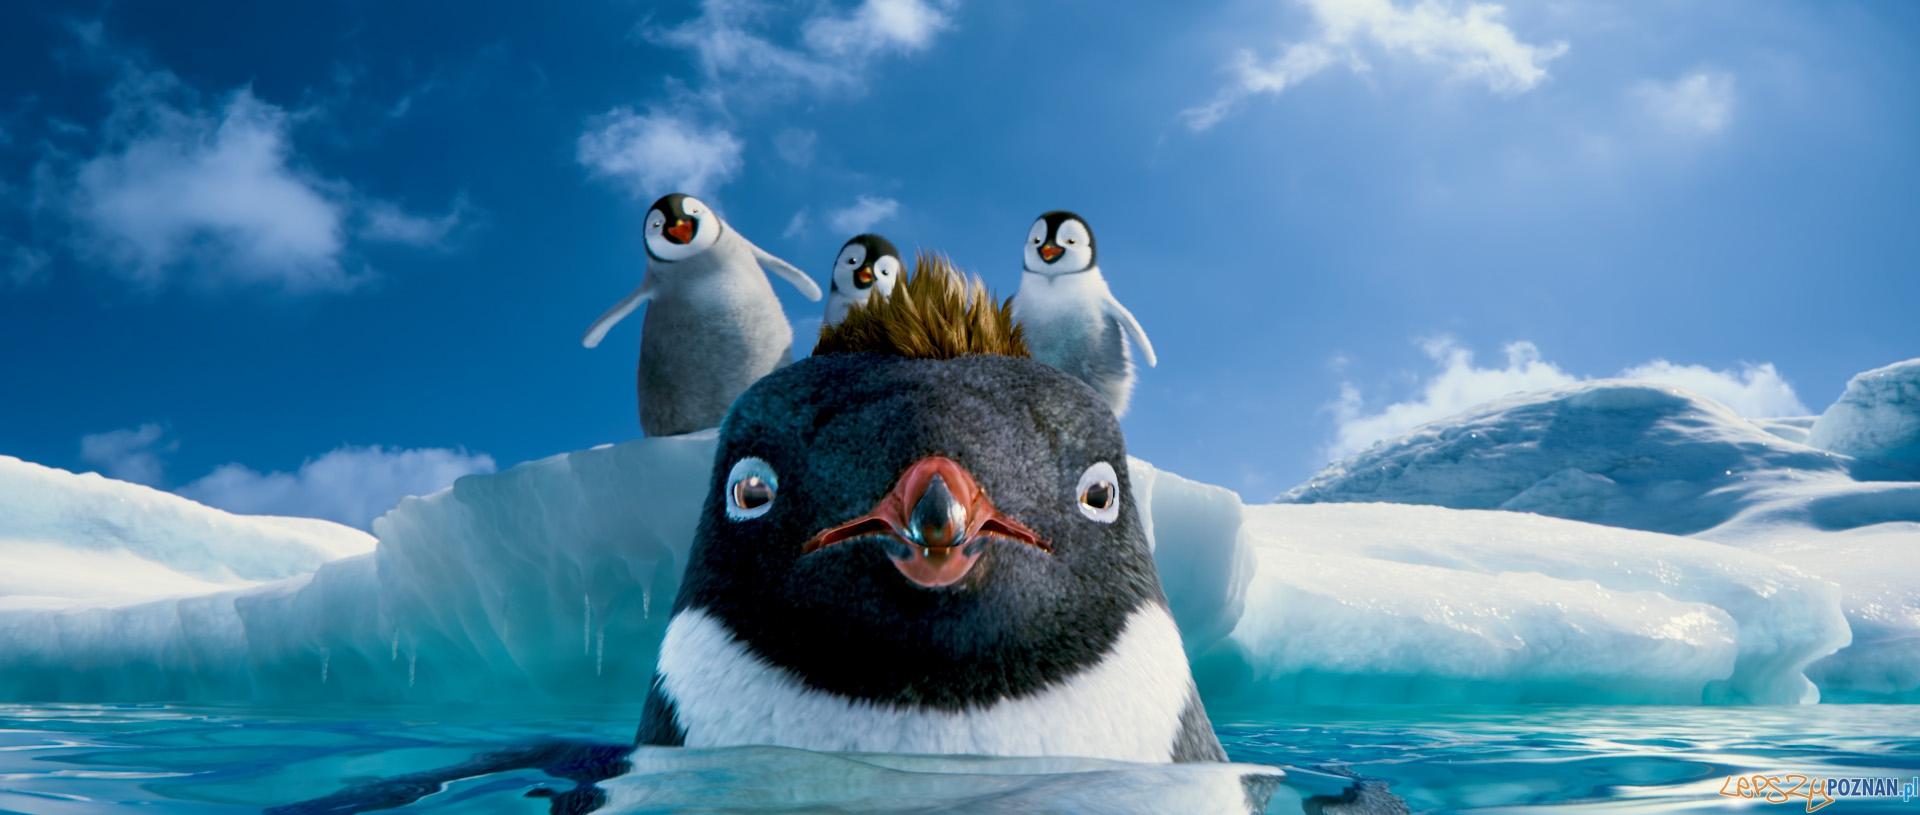 Happy Feet: Tupot małych stóp 2 3D  Foto: Warner bros. Entertainment Inc.